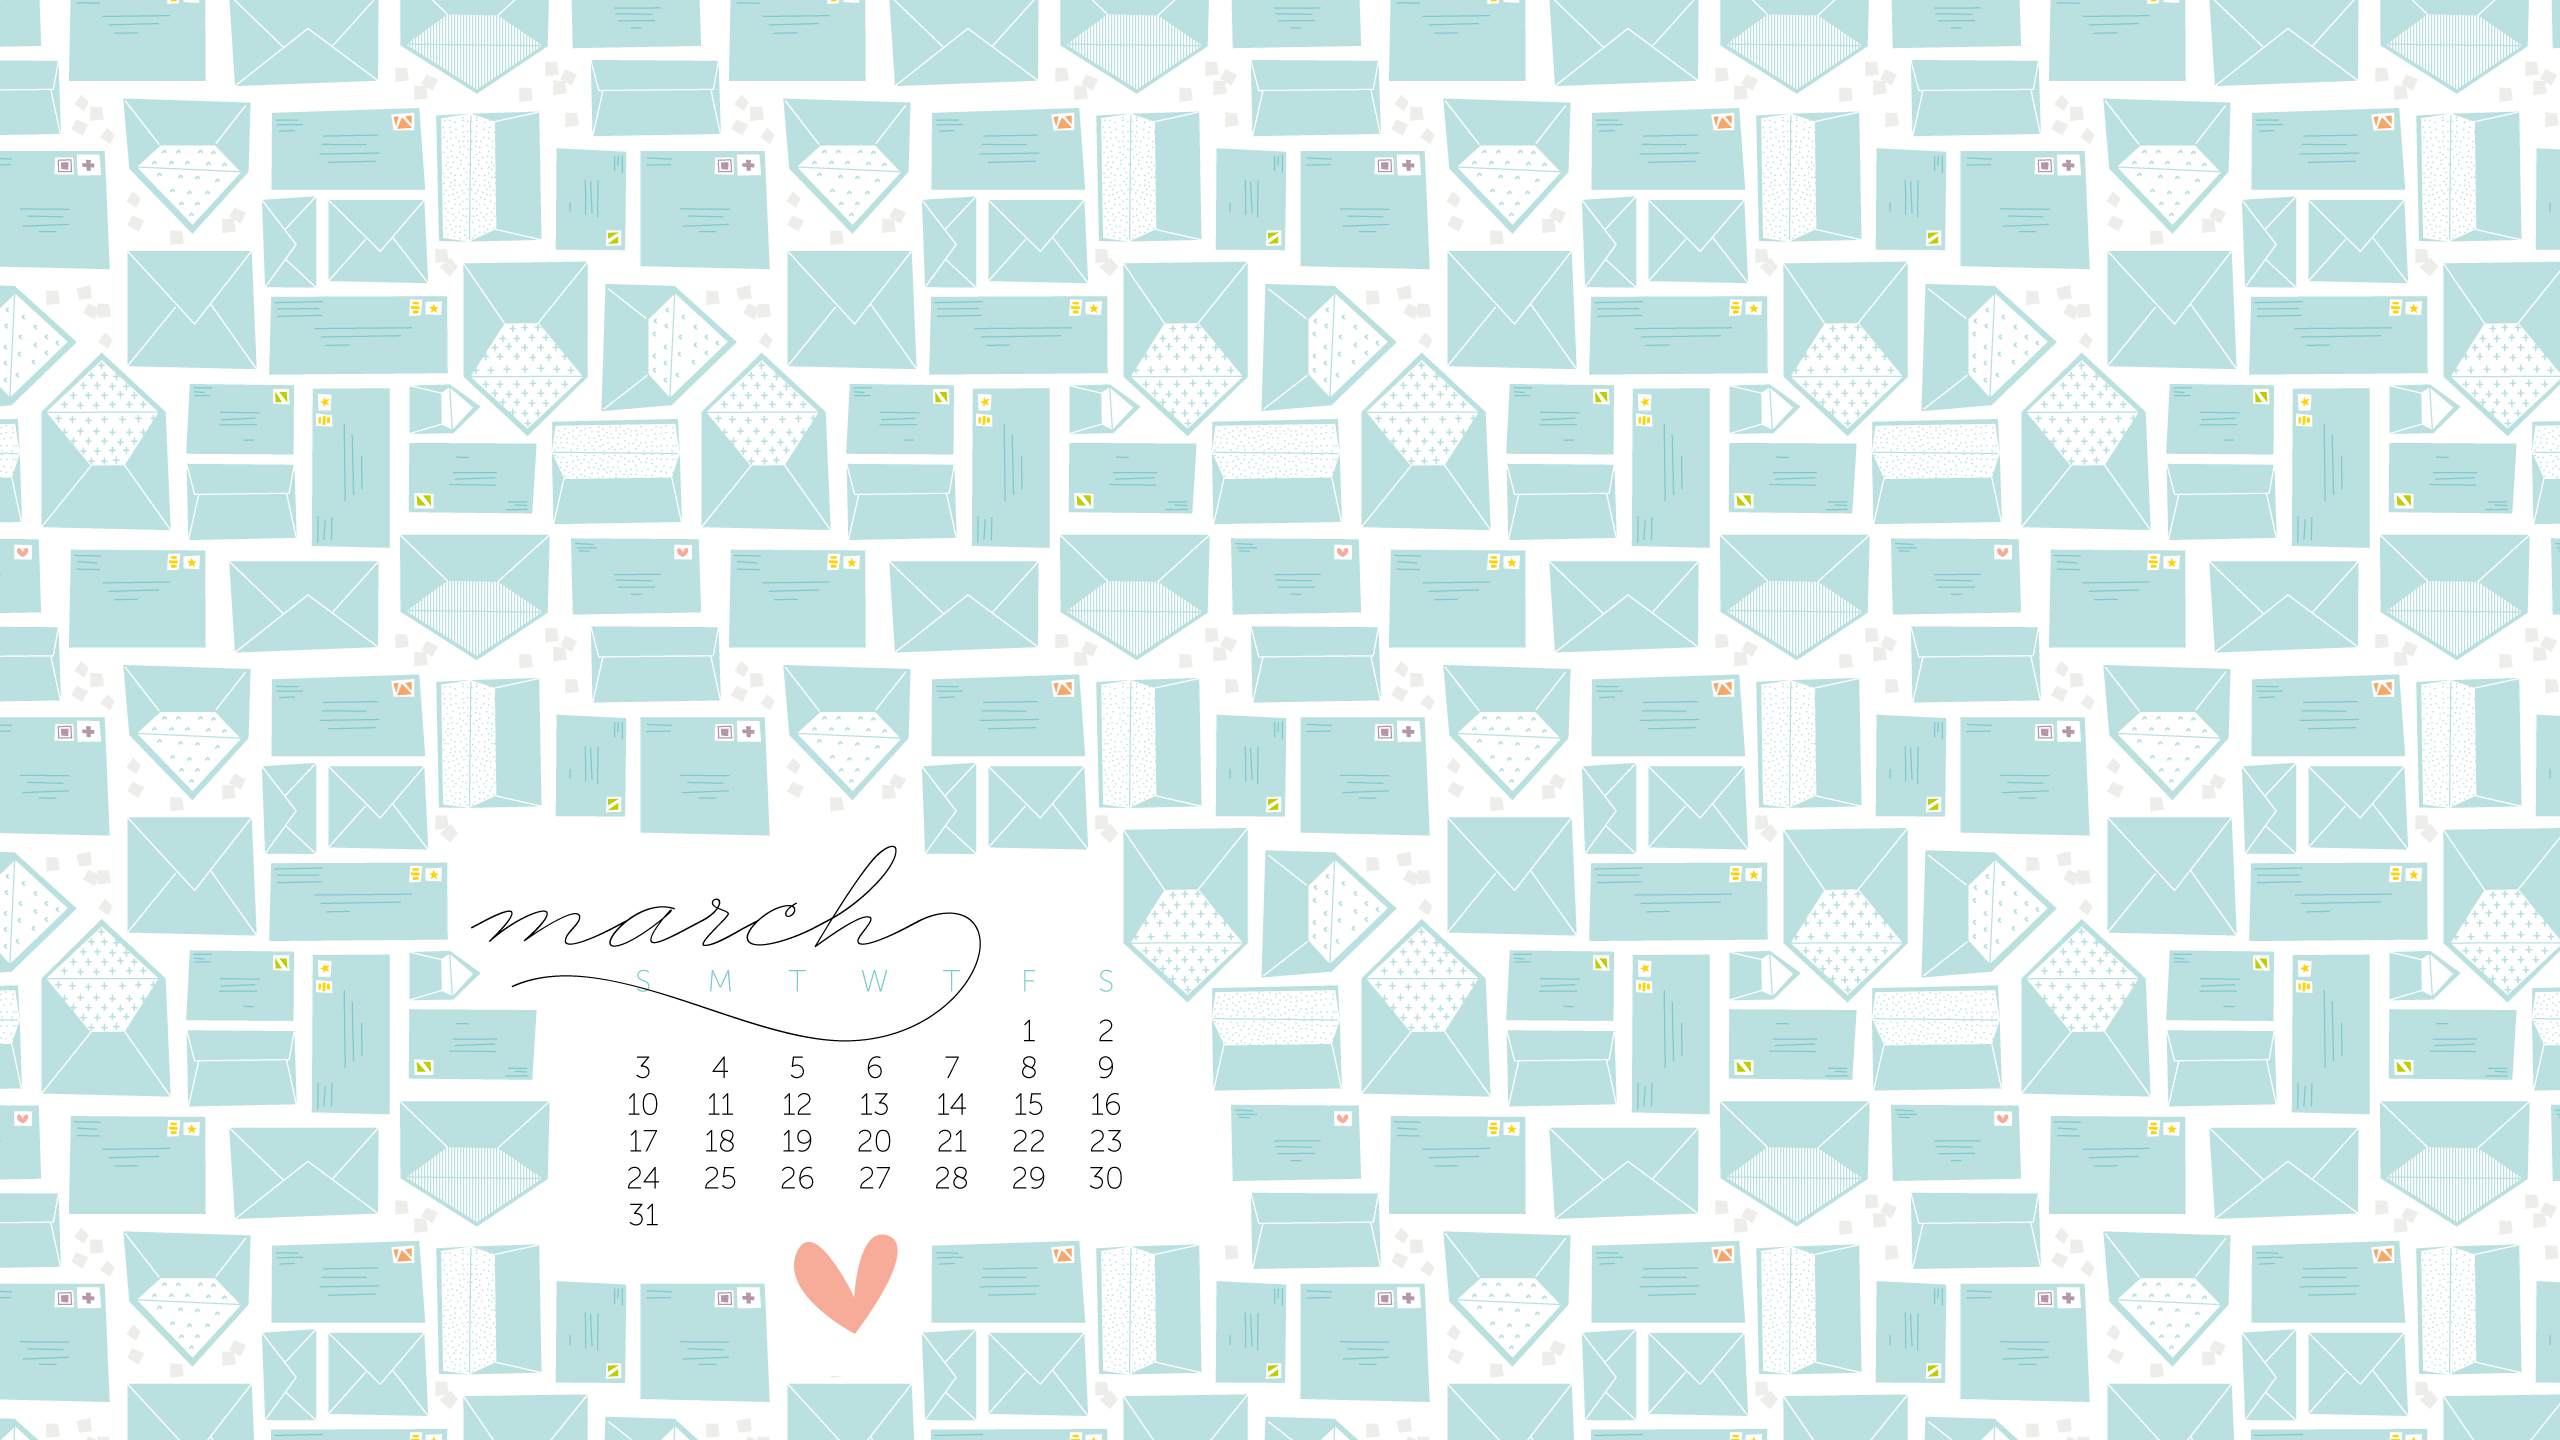 March Desktop Backgrounds  Wallpaper Cave regarding How To Make Google Calendar My Desktop Background